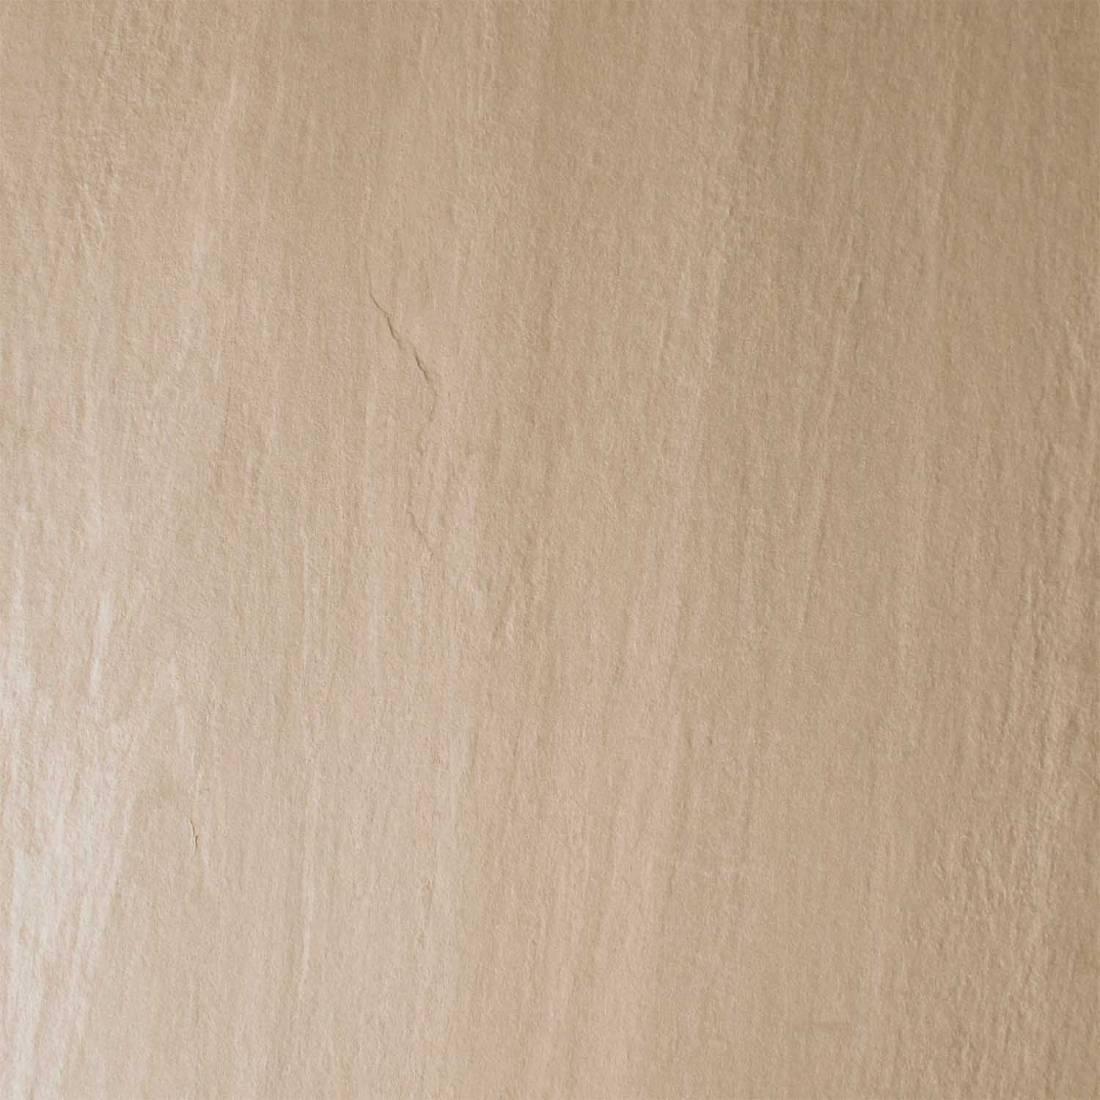 Paver Quartz 60x60x2 Beige Matt R11 1